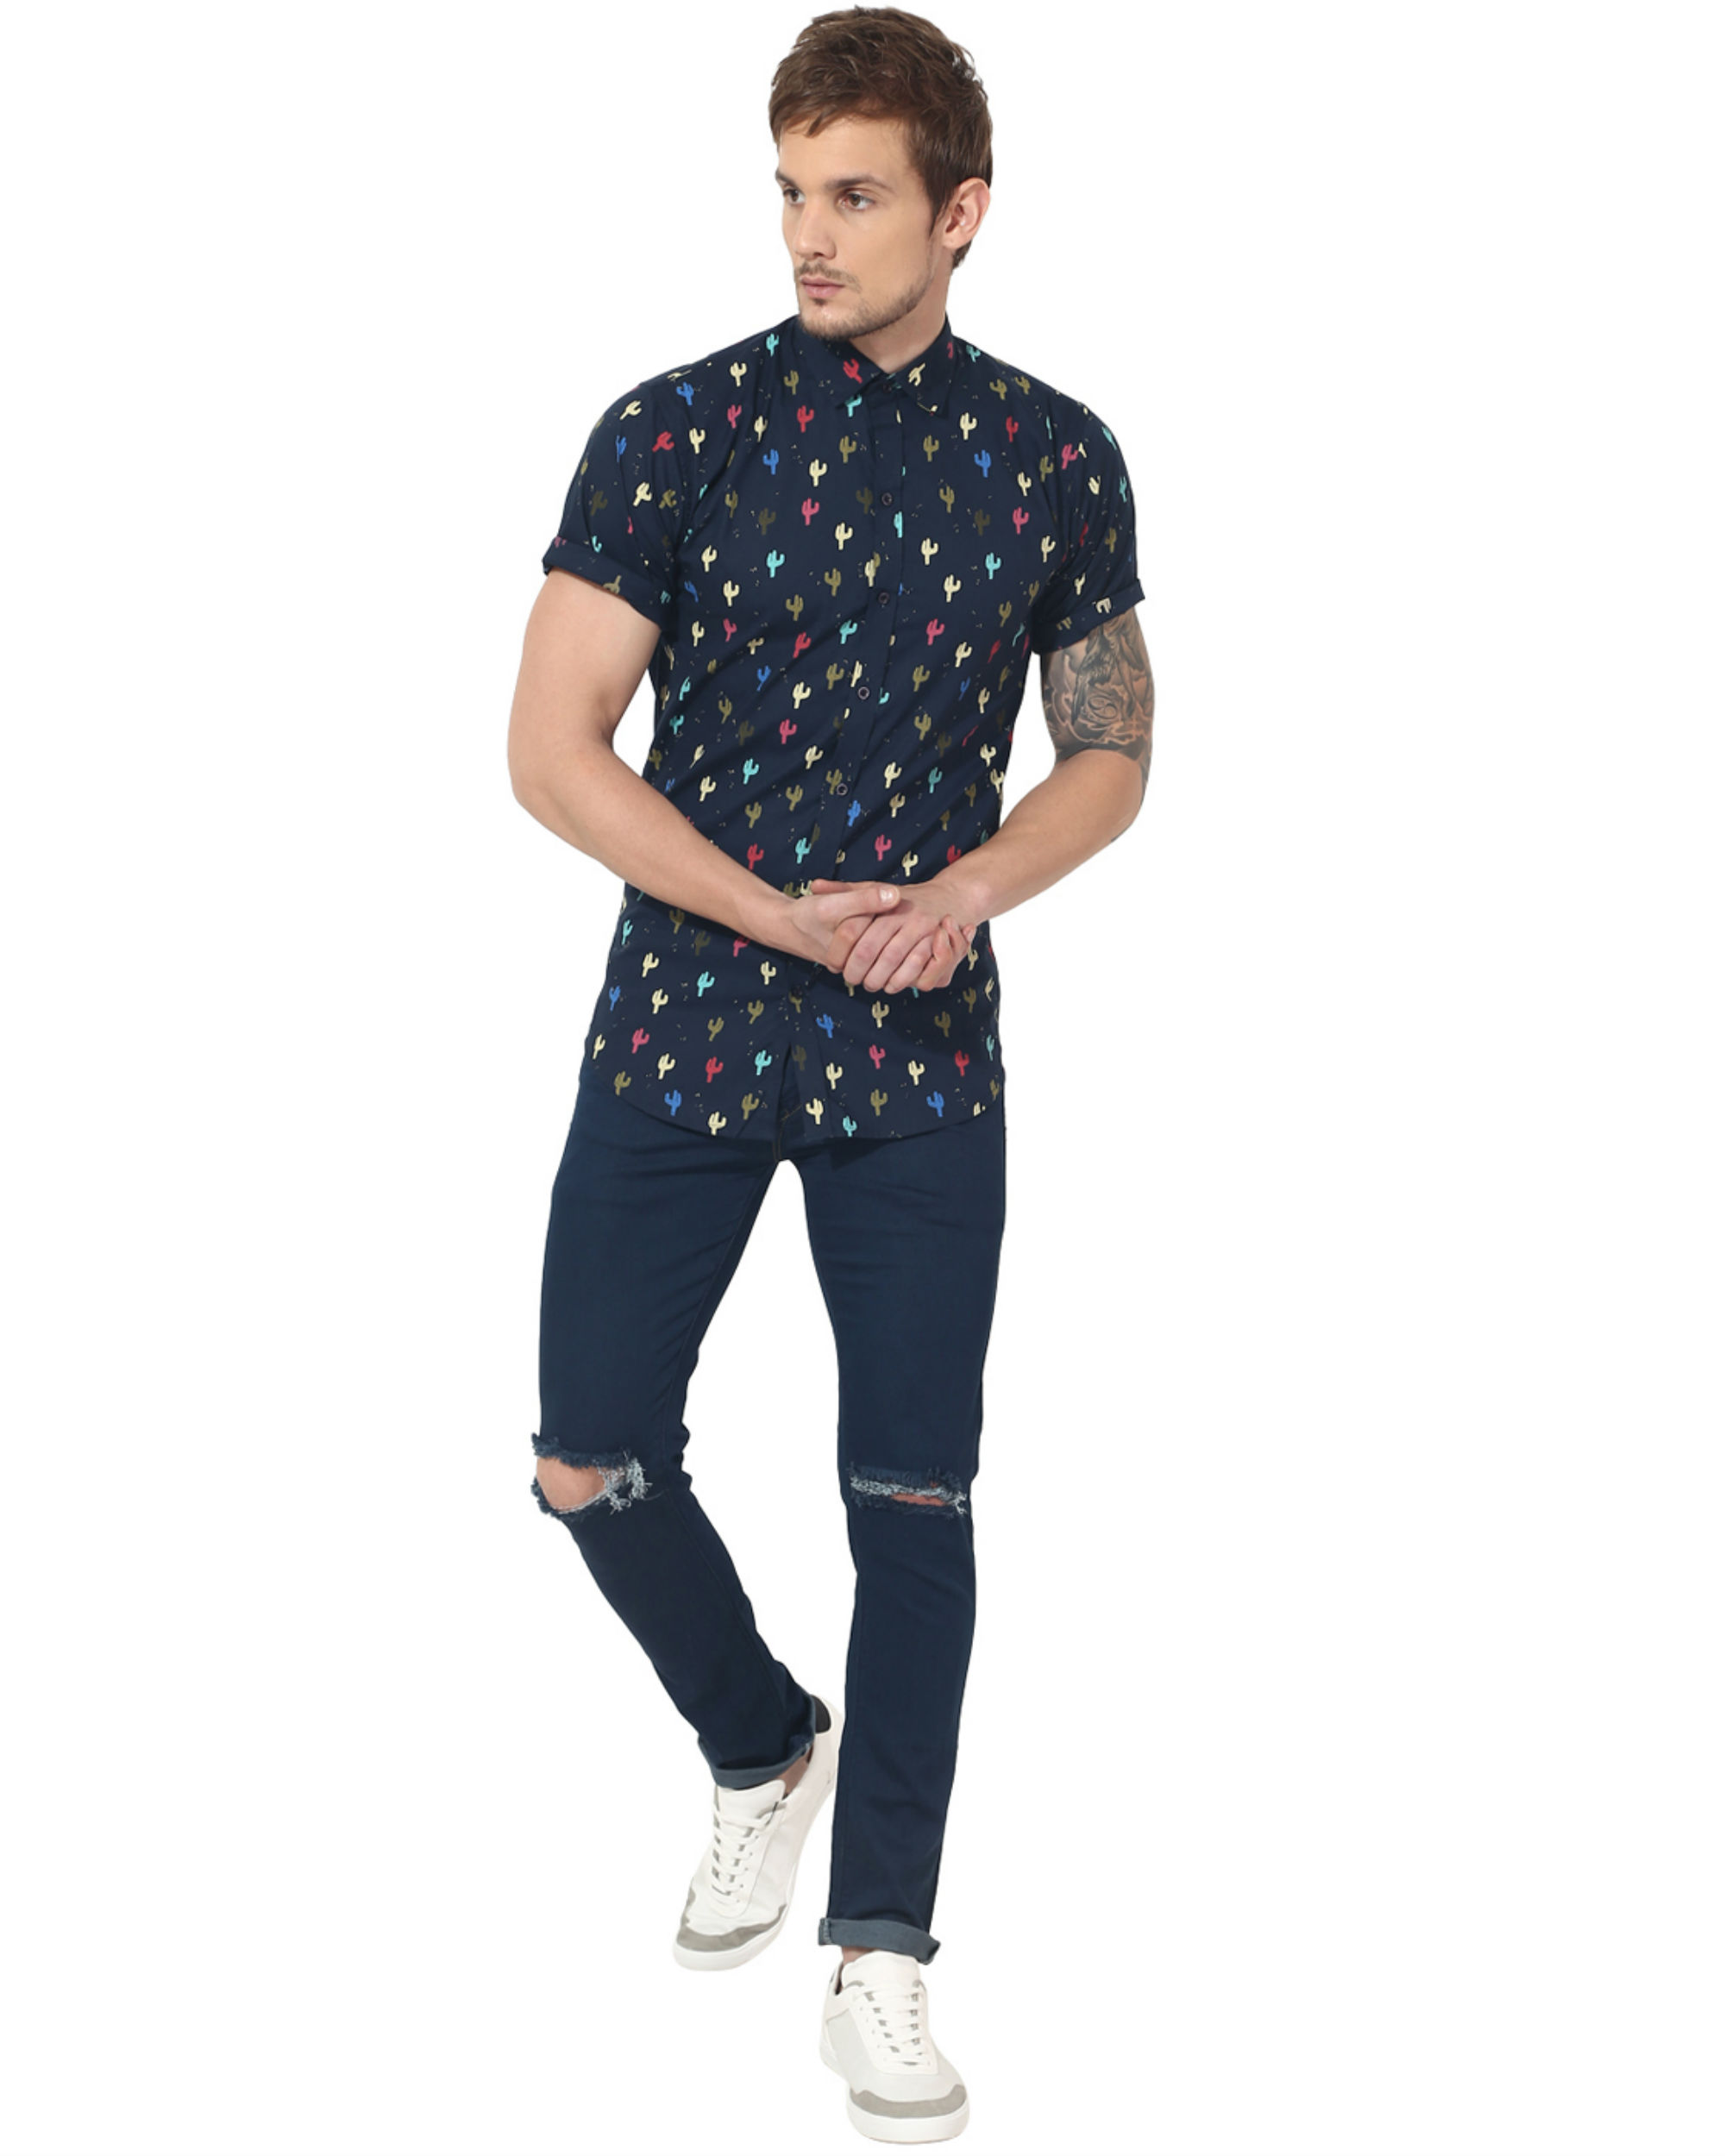 Blue cactus printed casual shirt